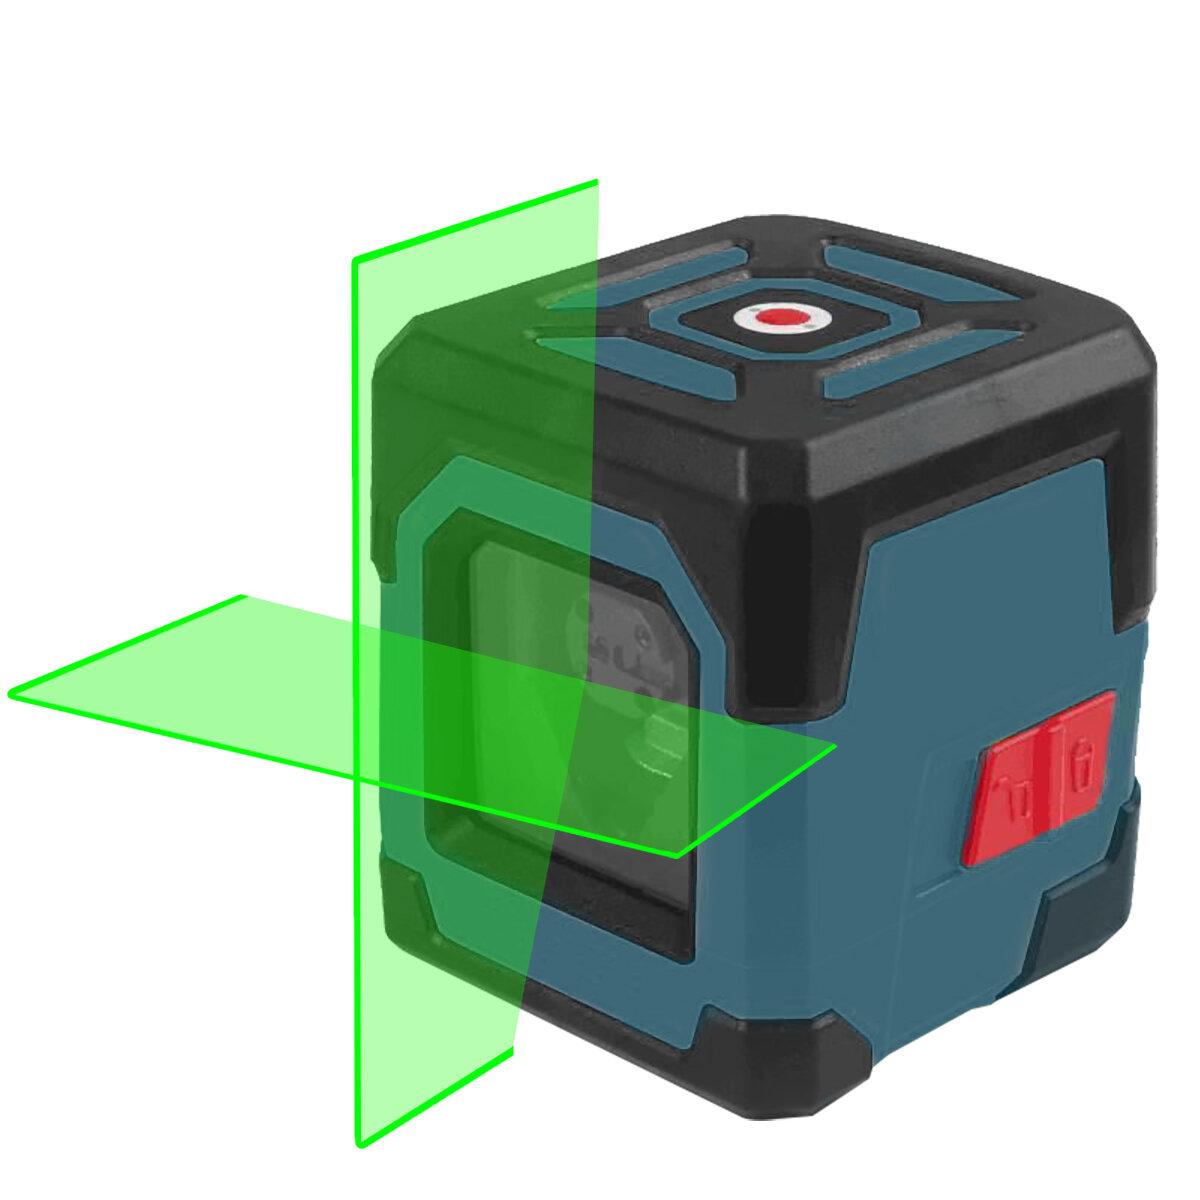 HANMATEK LV1G Laser Level Green Cross Line Laser with Measuring Range 50ft, Self-Leveling Vertical and Horizontal Line